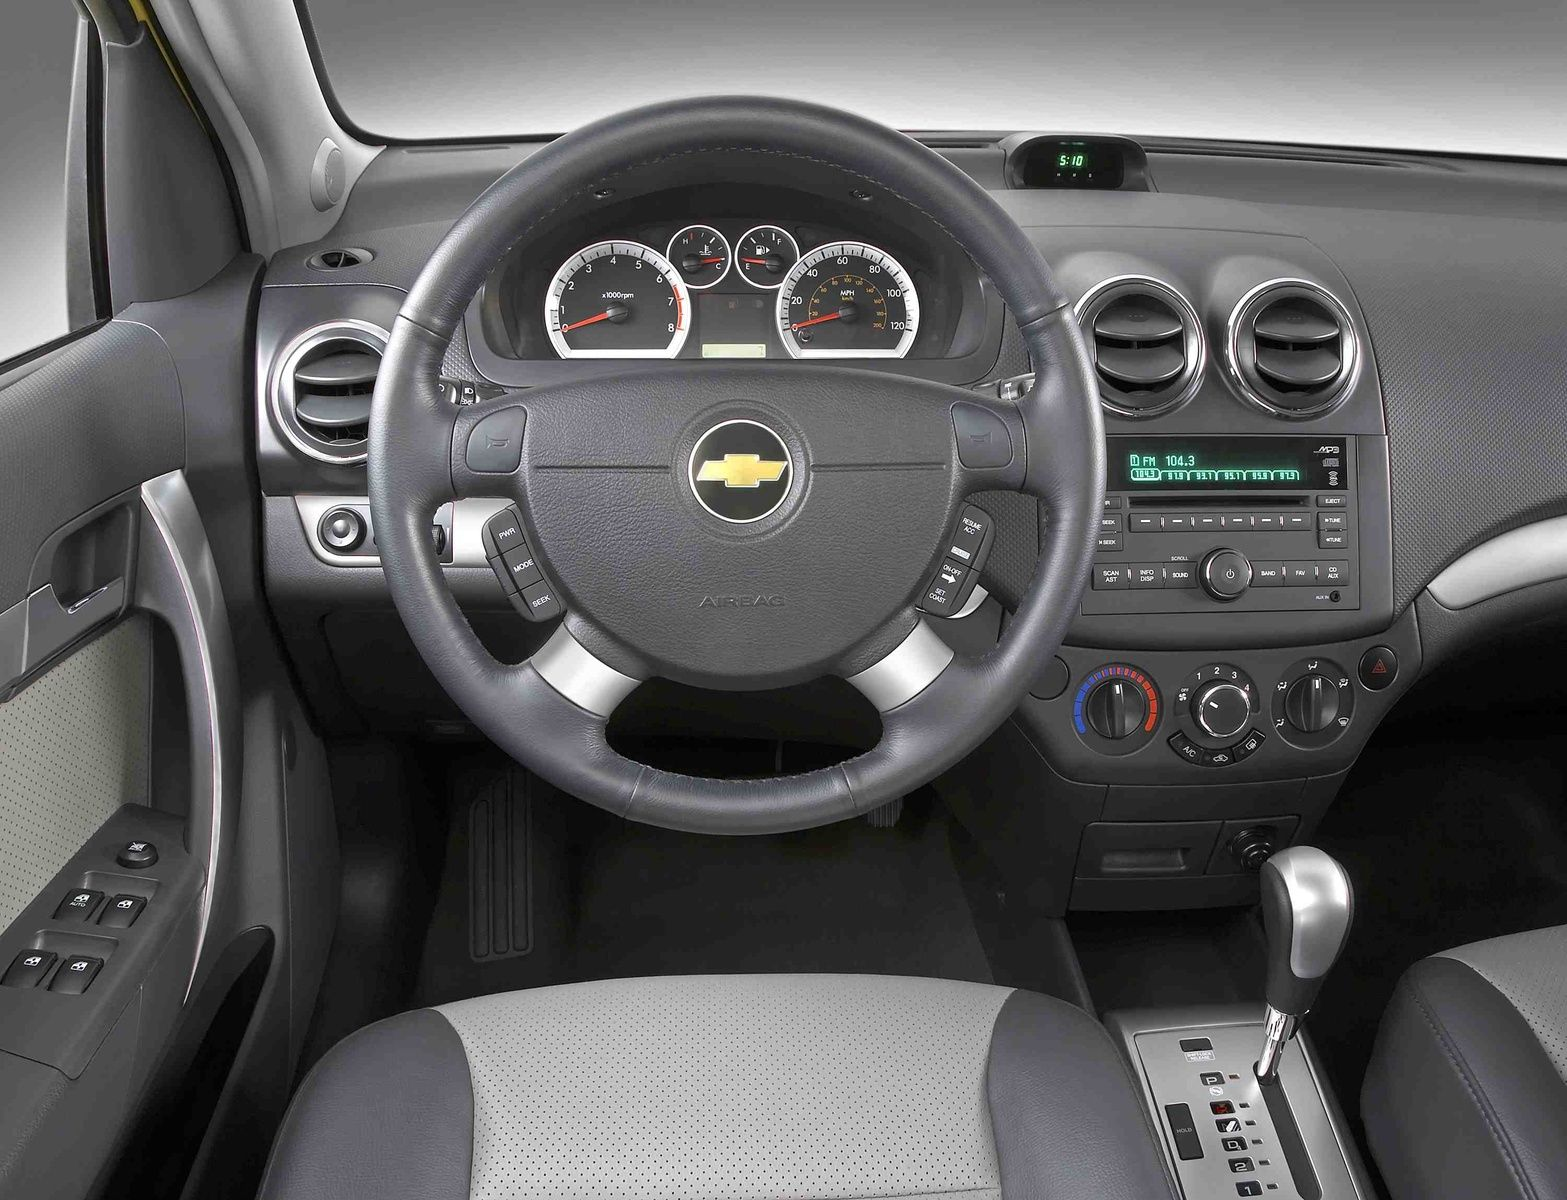 Chevrolet Aveo Chevrolet Aveo Chevrolet Camaro Interior